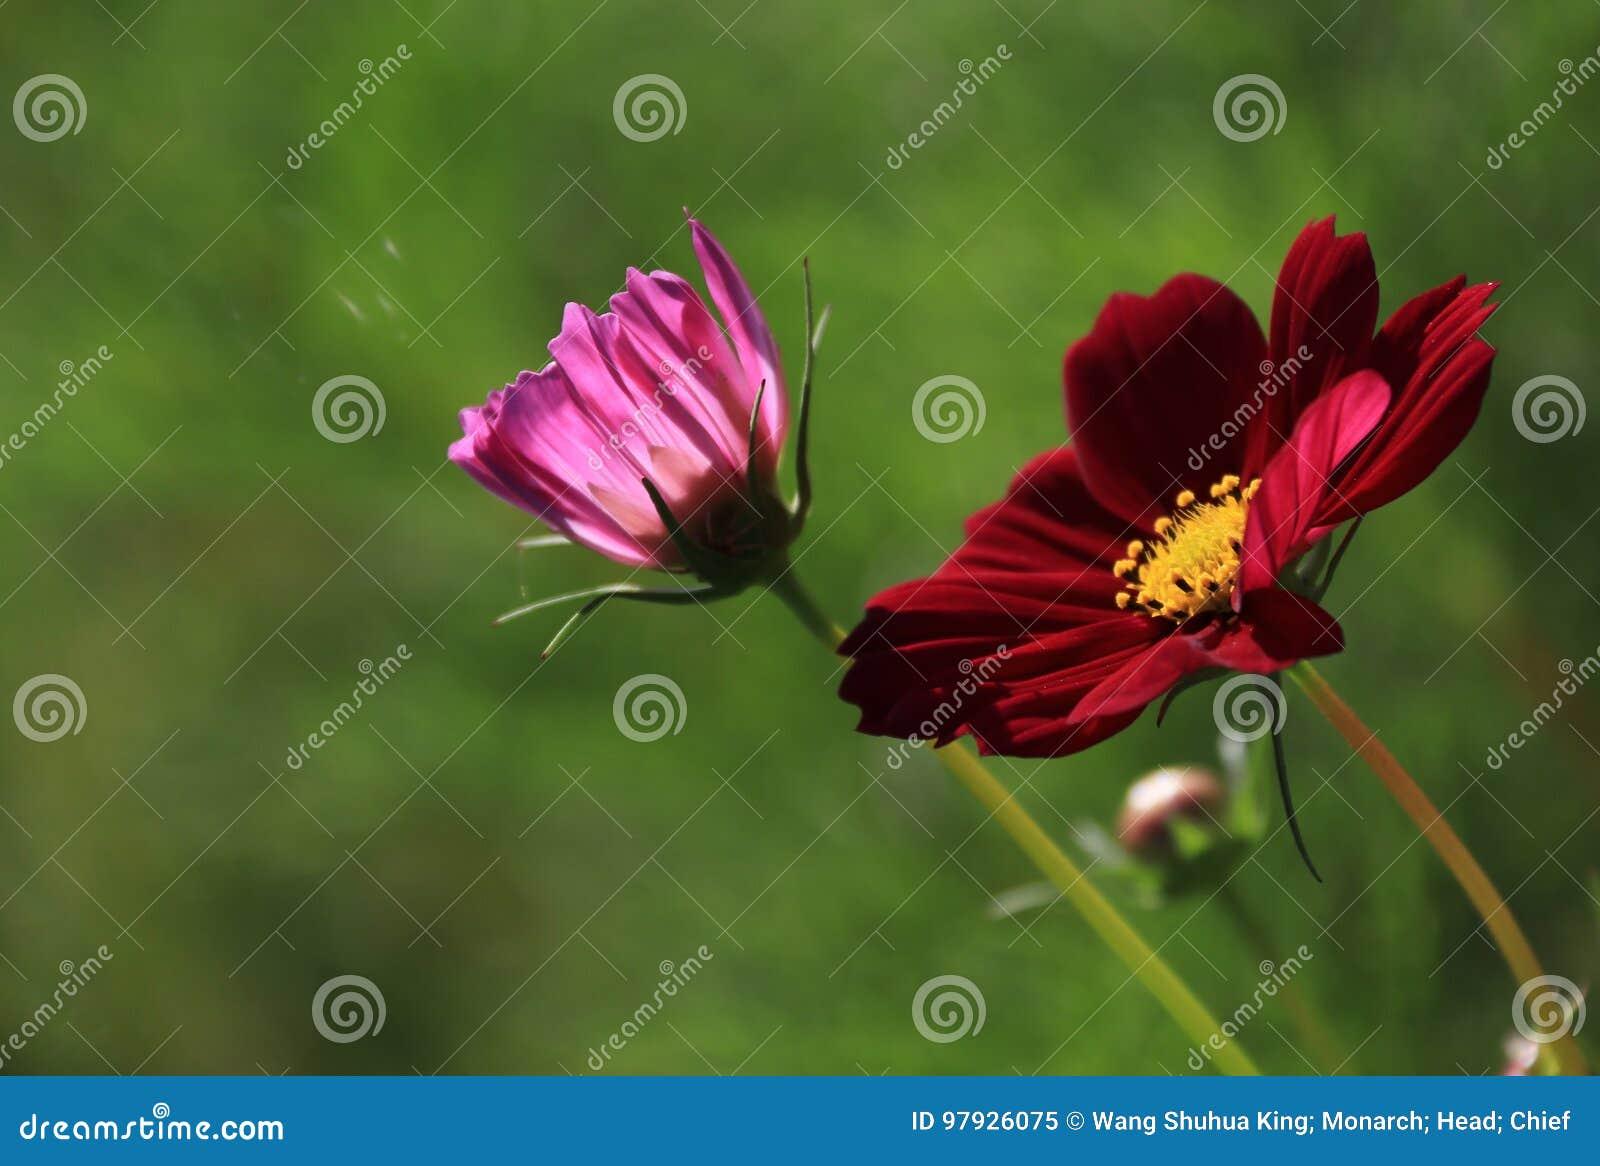 Flower Stock Image Image Of Garden Goodnn Beautiful 97926075